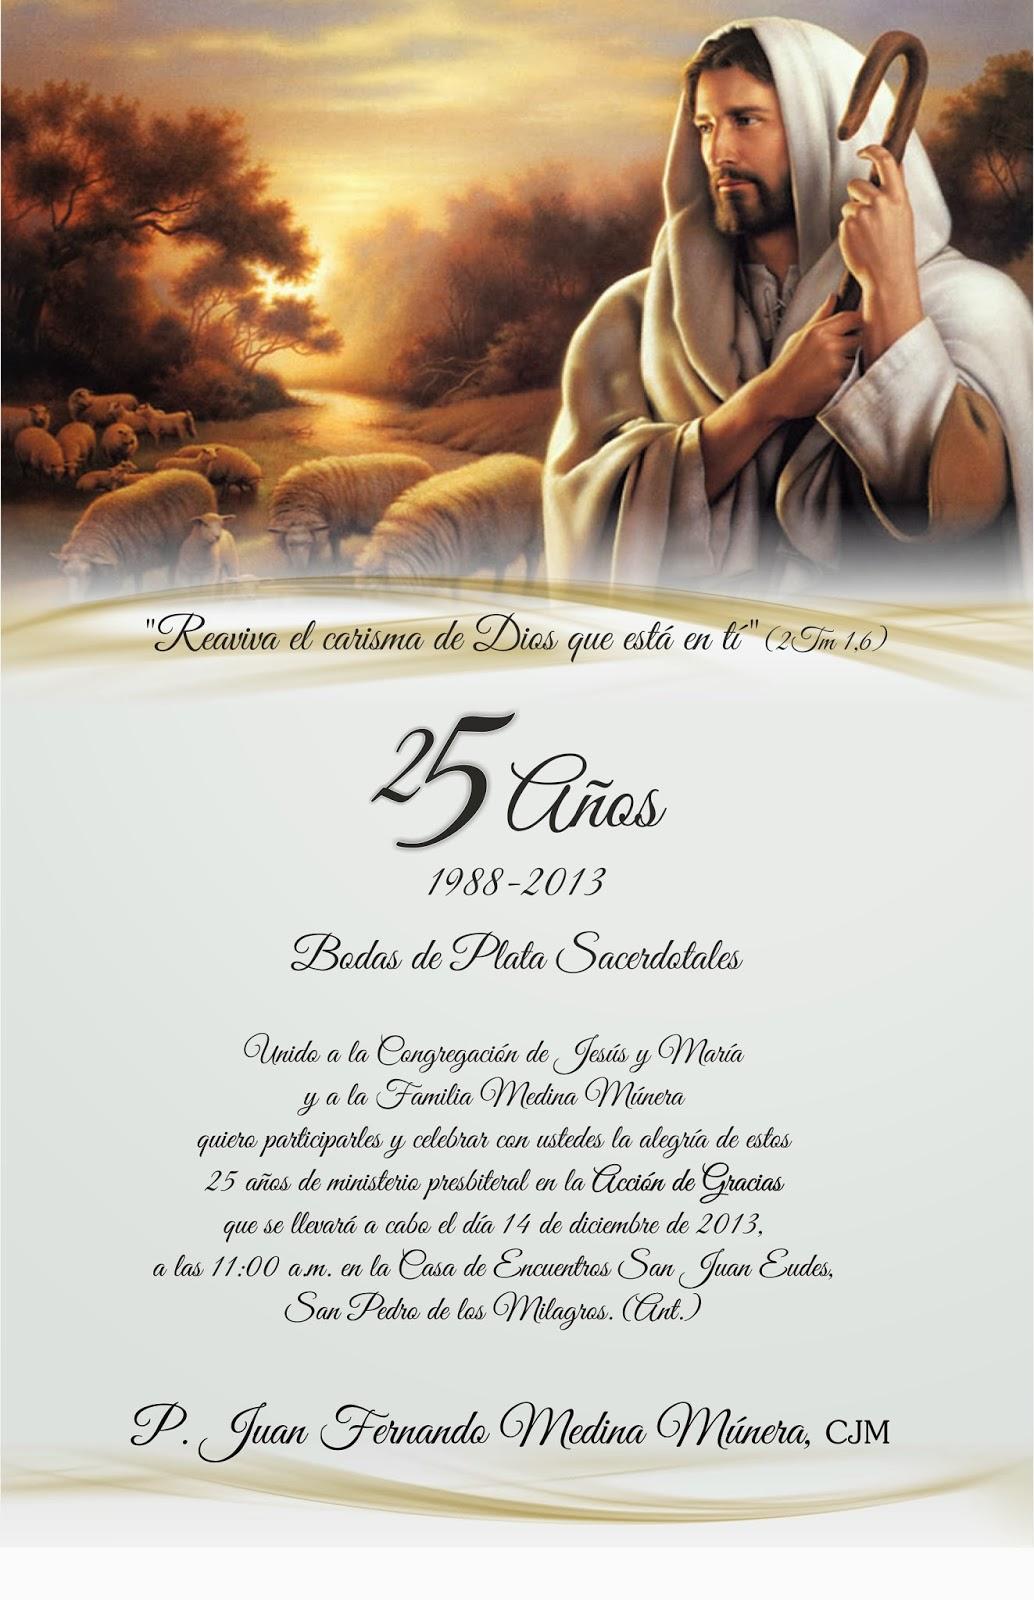 Cjm News Invitación Bodas De Plata Sacerdotales P Juan